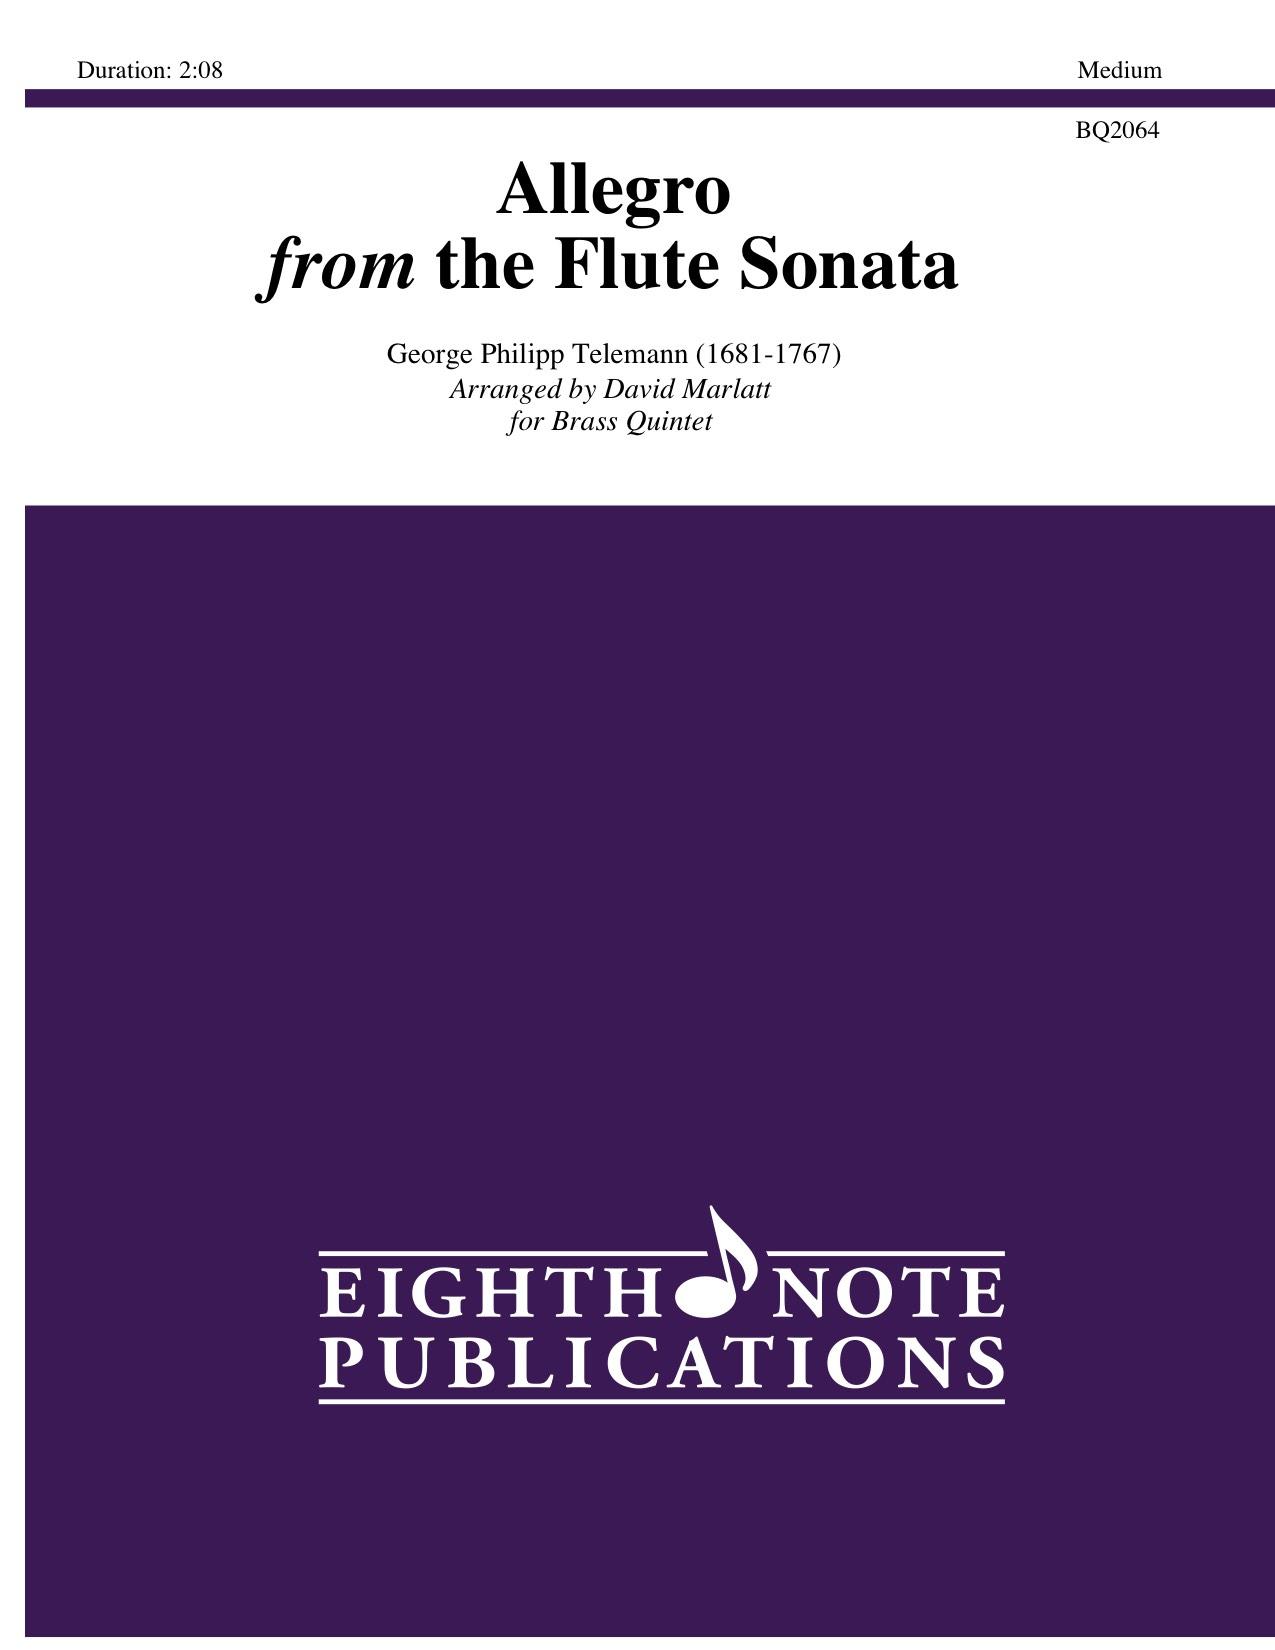 Allegro from the Flute Sonata  - George Philipp Telemann